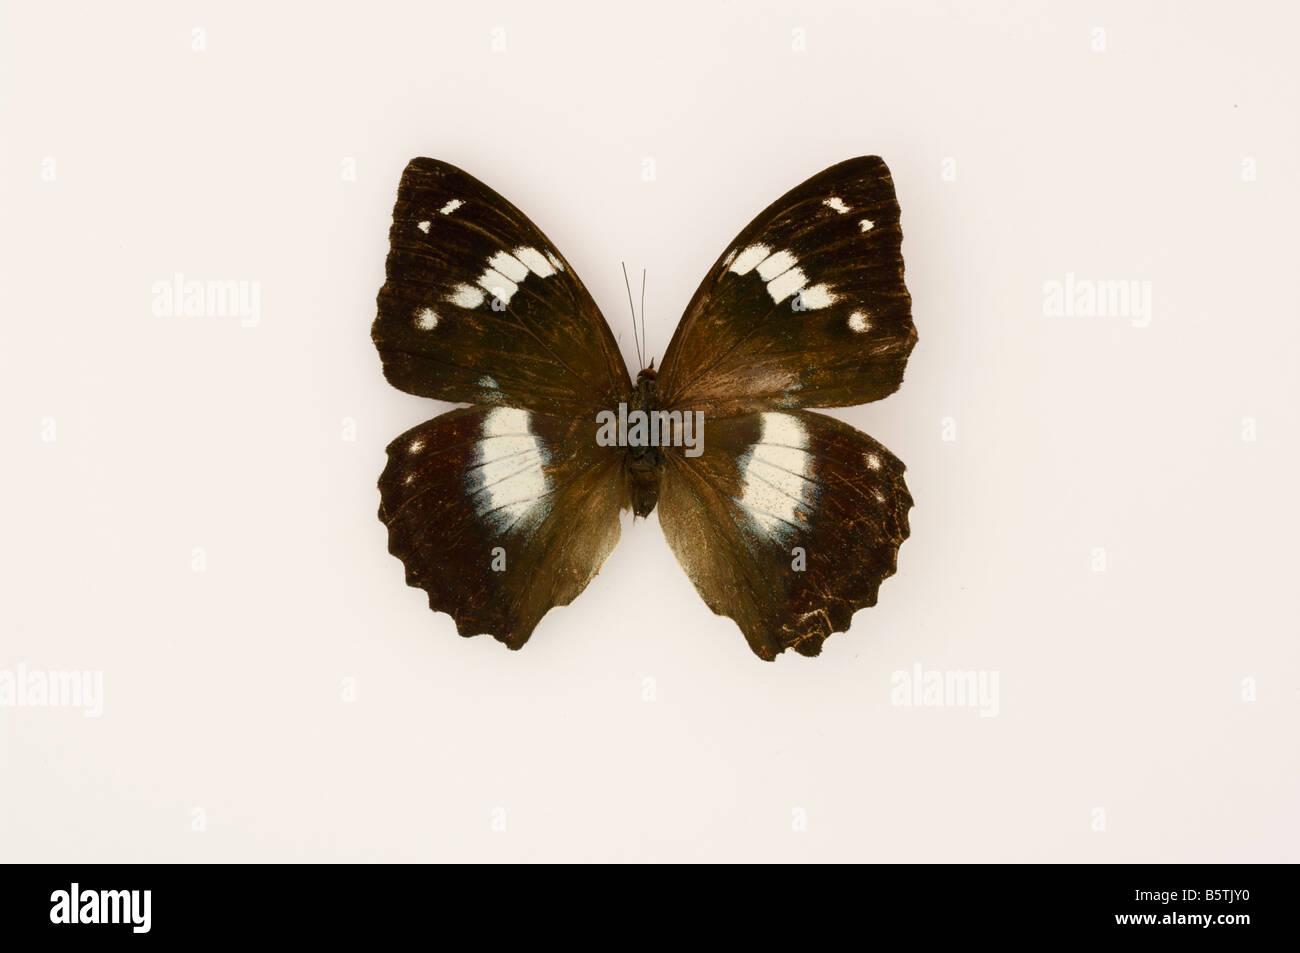 Farfalle tropicali insetti Immagini Stock